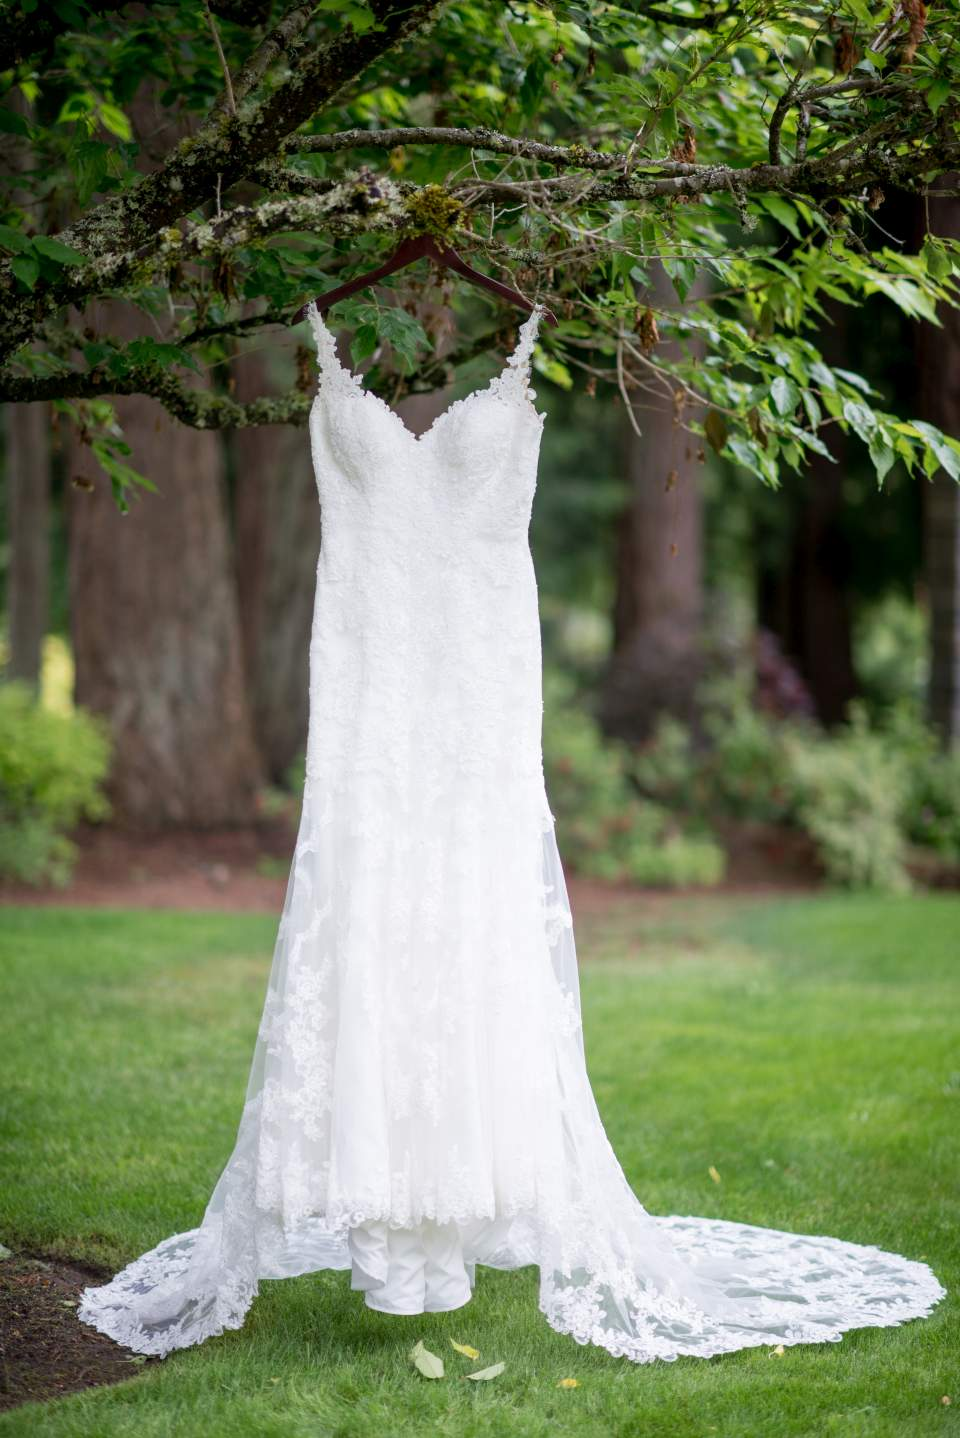 beautiful lace wedding dress hanging in garden